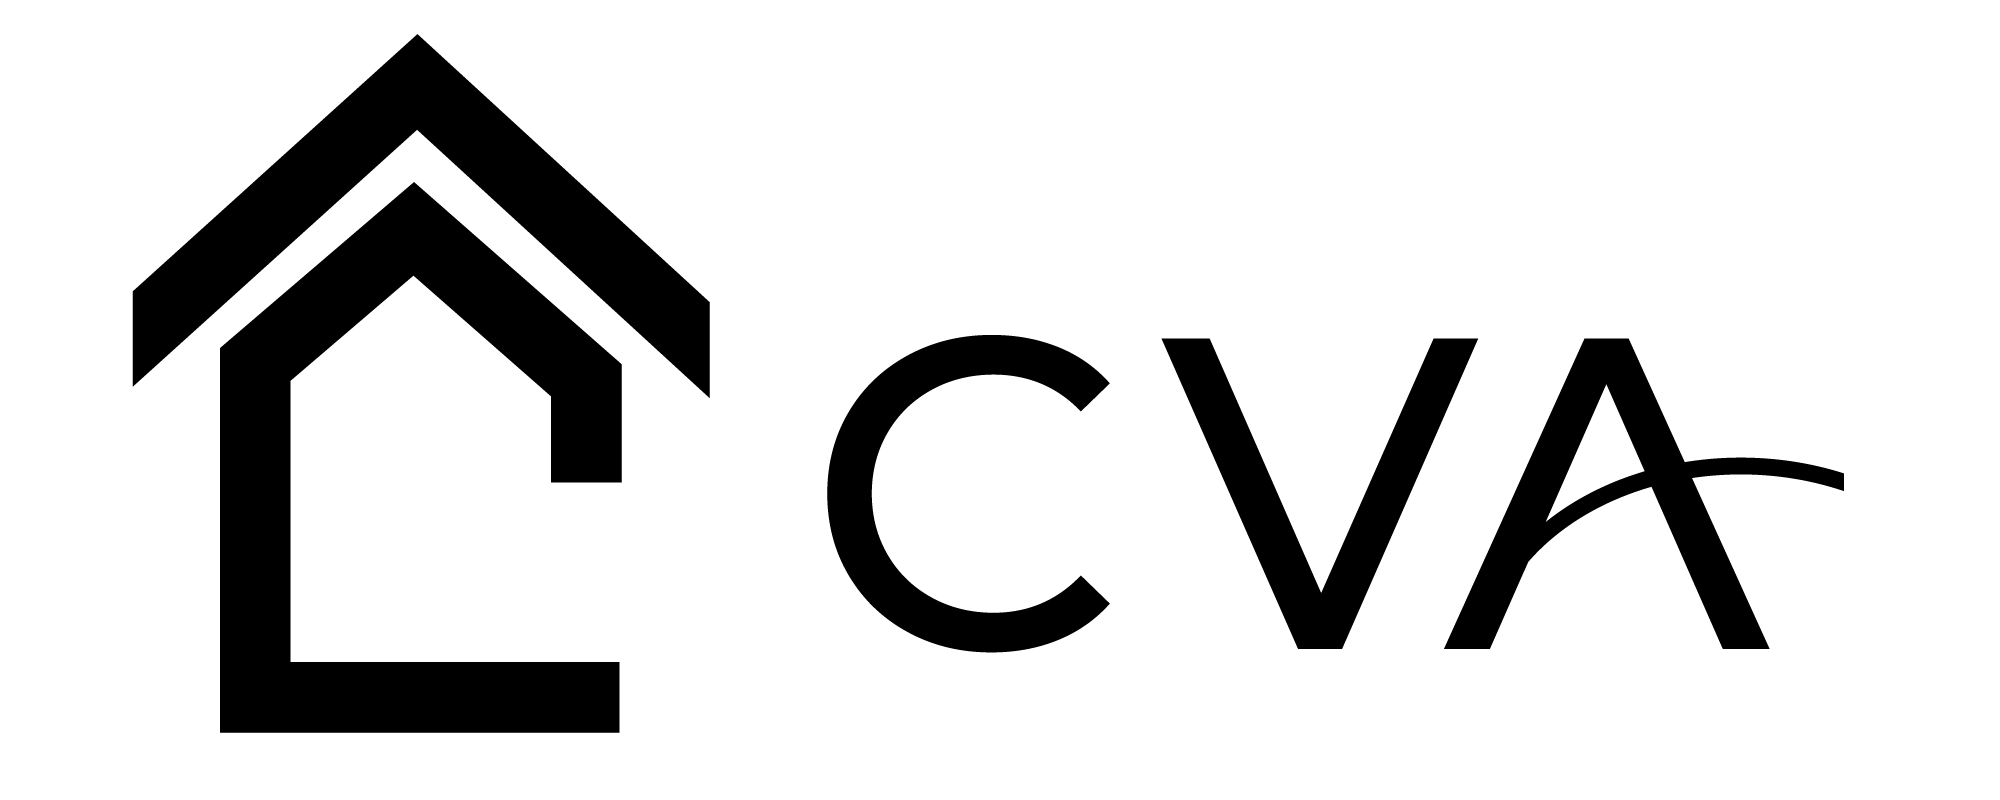 FBH / CVA LLC logo